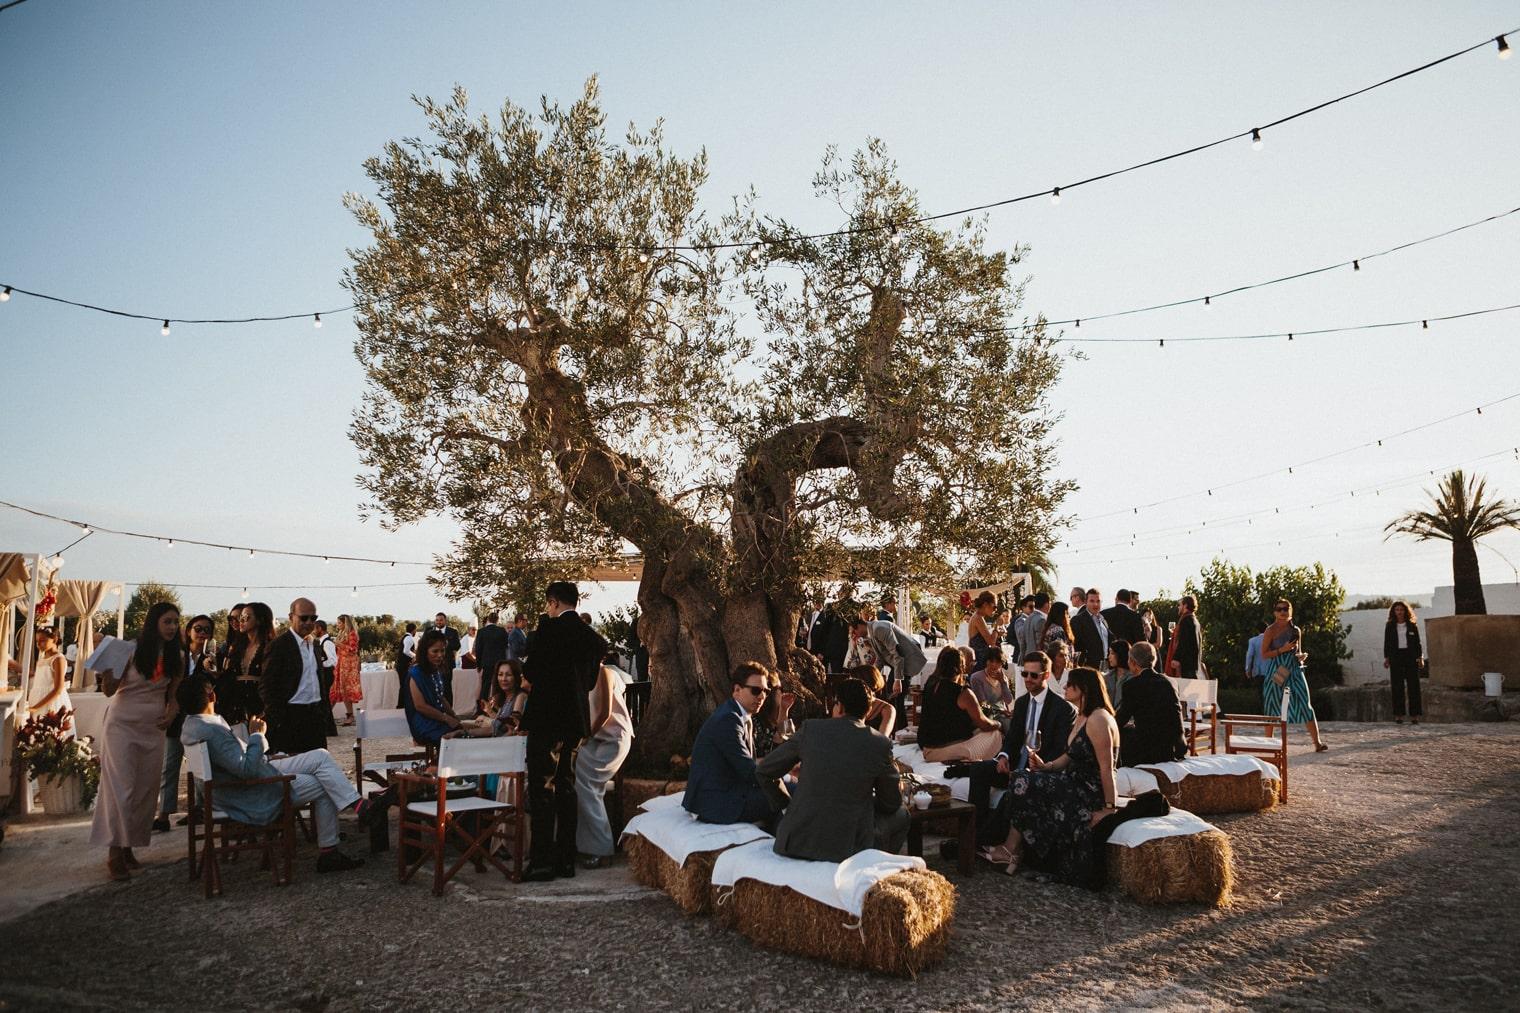 masseria de torre coccaro wedding